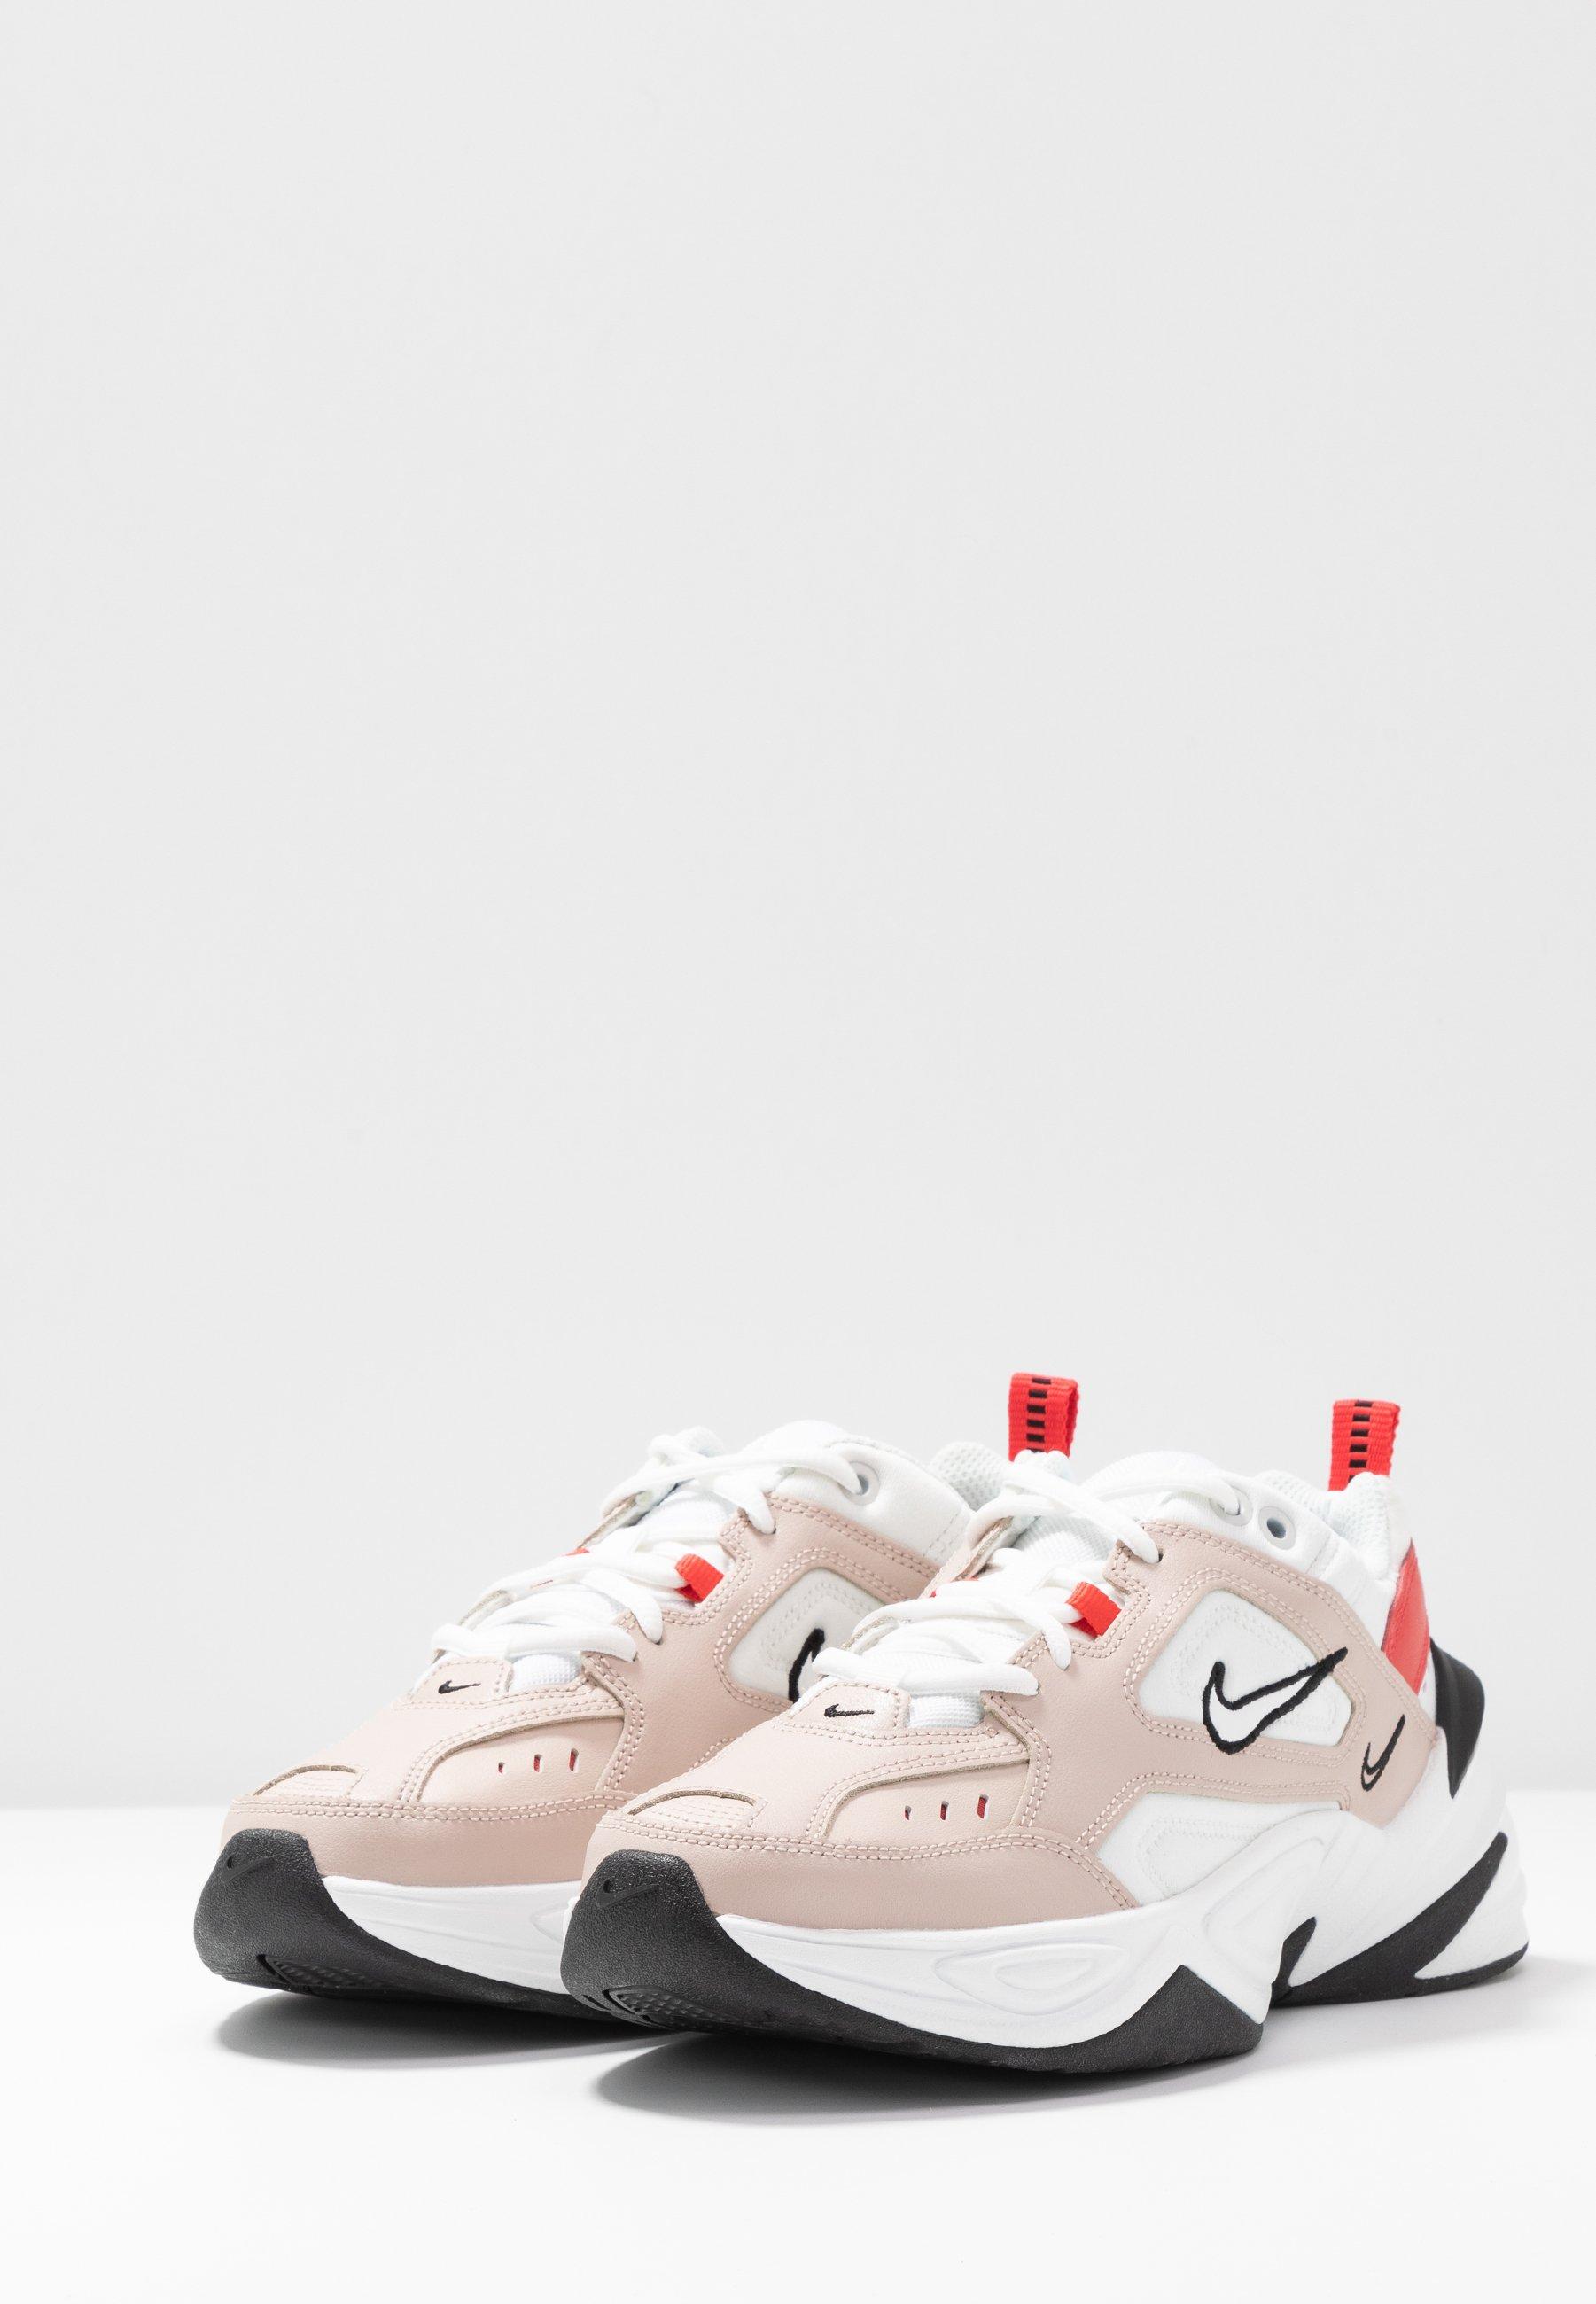 Kjøp Nike W M2k Tekno Platinum Tintwhite teal Tint sko